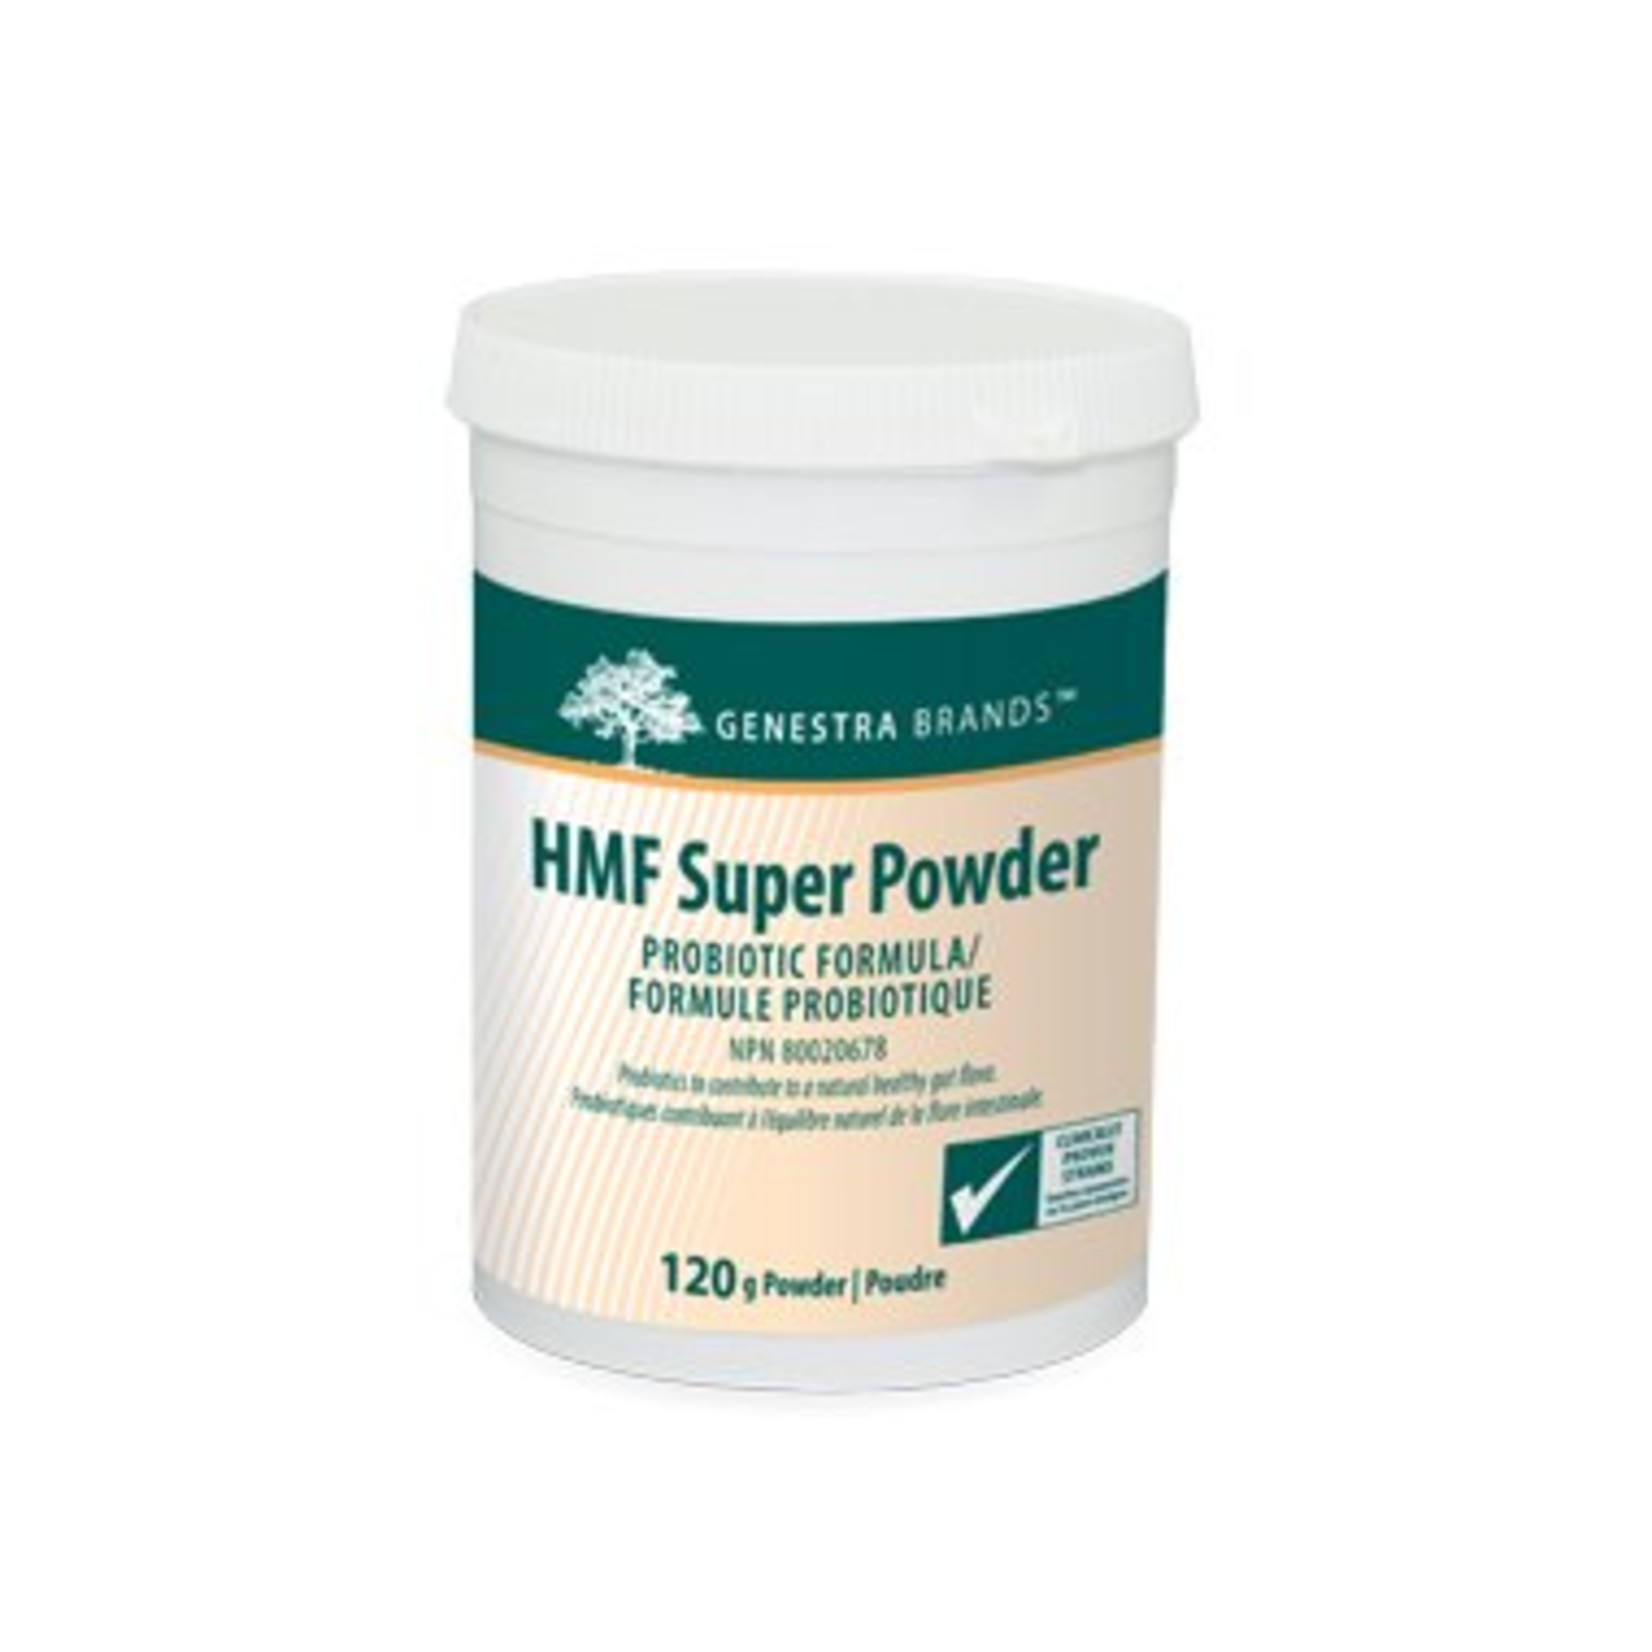 Genestra Genestra HMF Super Powder Probiotic Formula 120g